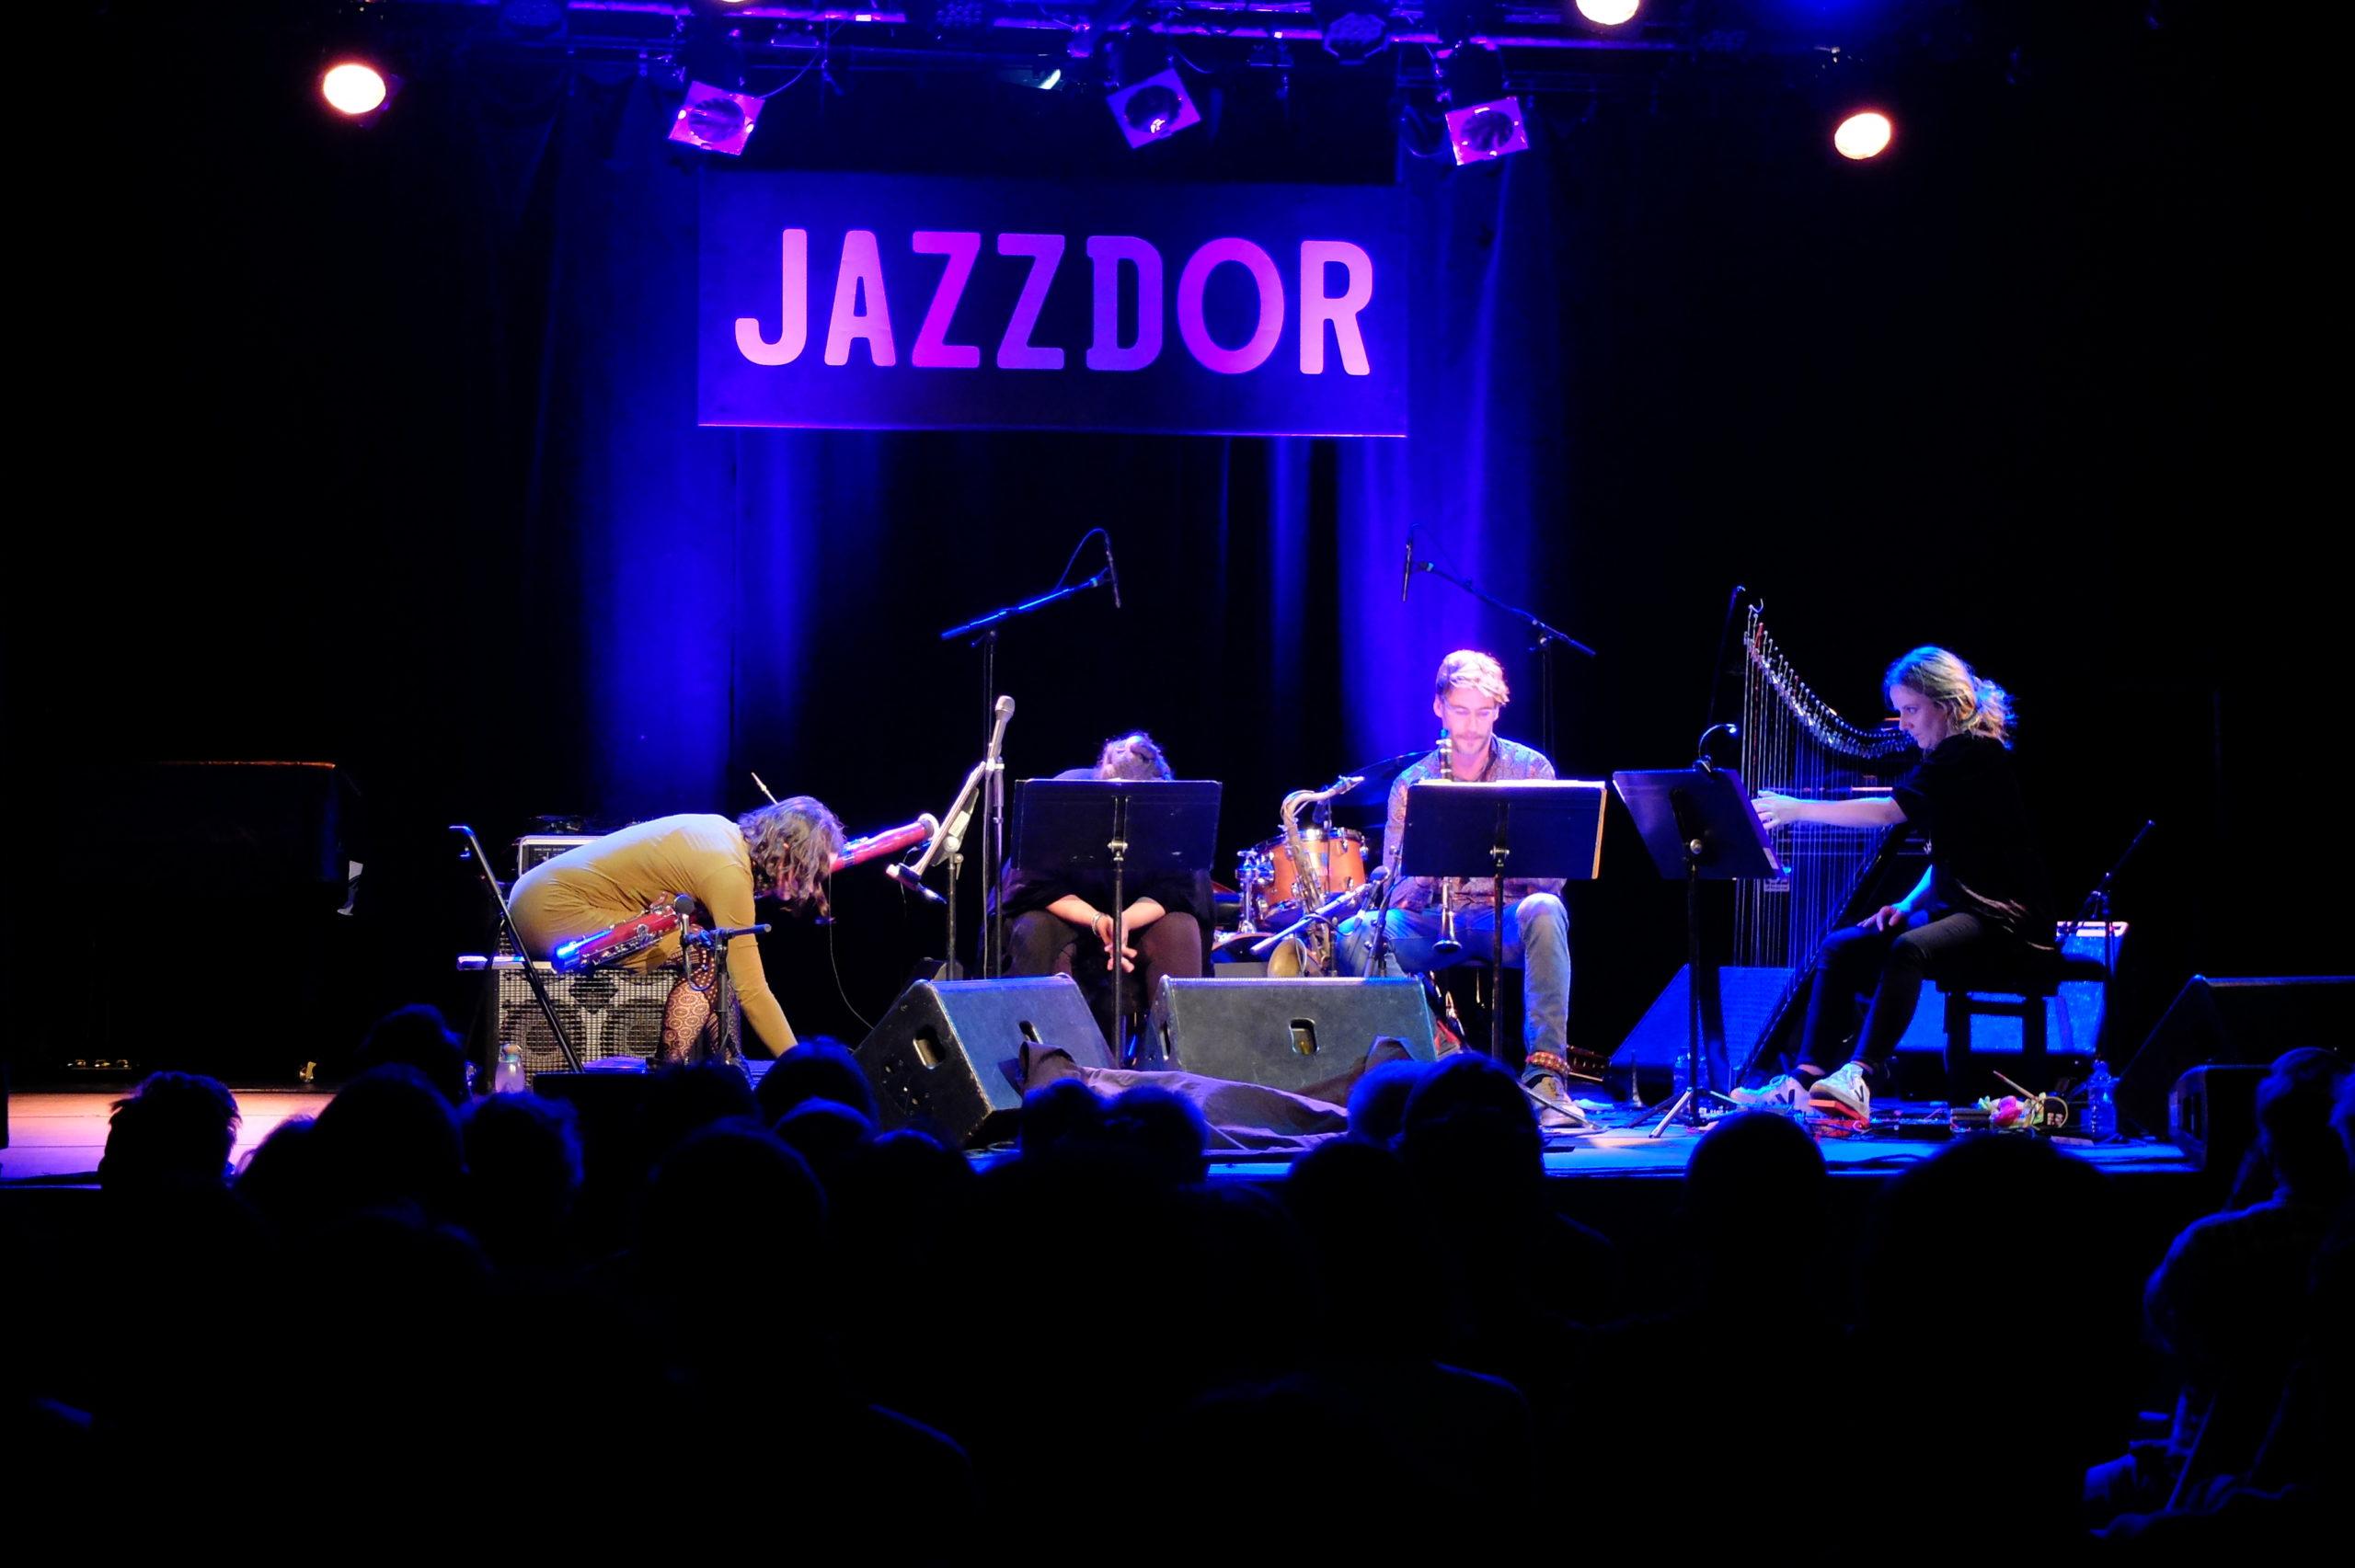 Ikui Doki à Jazzdor